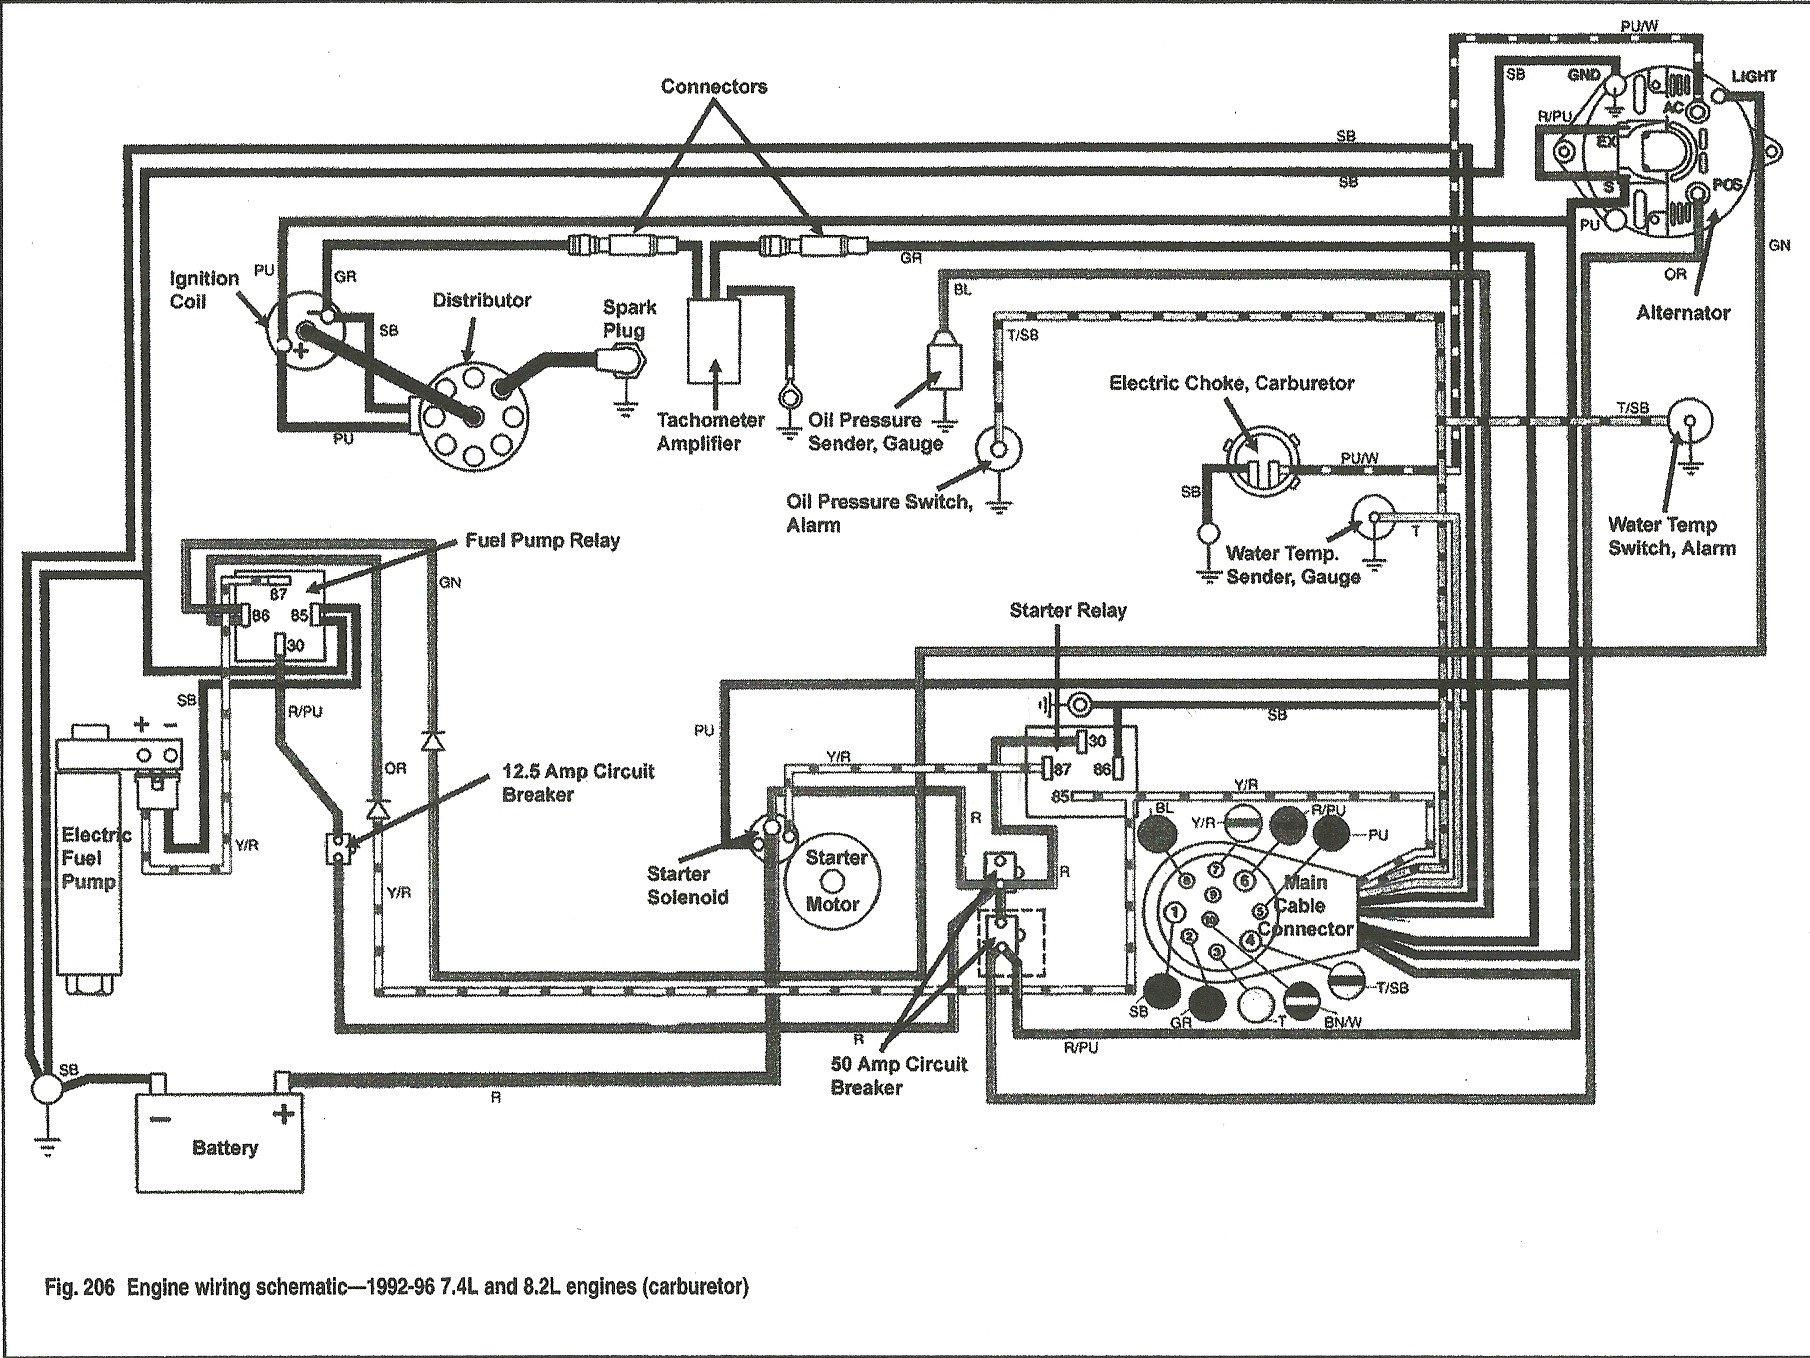 Volvo D1 30 Wiring Diagram - Wiring Diagram Direct mine-crystal -  mine-crystal.siciliabeb.it | Volvo Penta 4 3gl Wiring Diagram |  | mine-crystal.siciliabeb.it